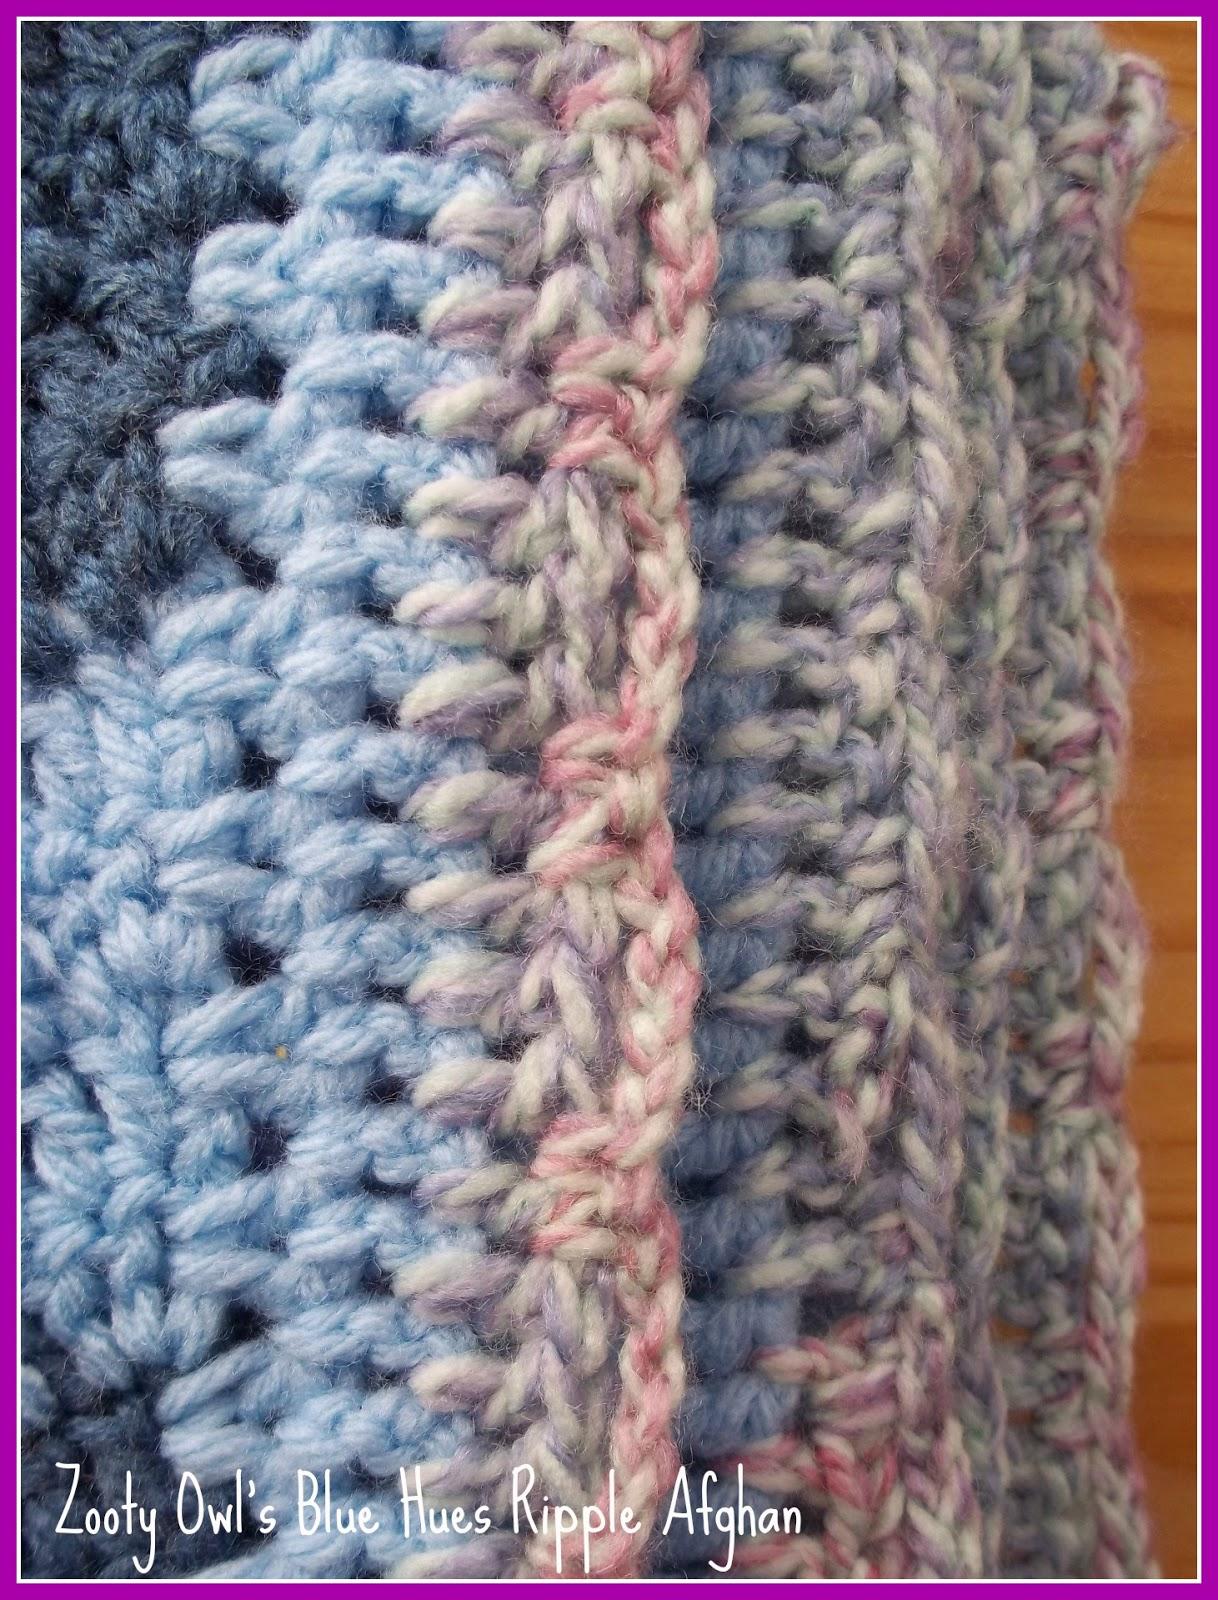 Crochet Afghan Patterns With Variegated Yarn : Zooty Owls Crafty Blog: Ripple Crochet Afghan: Blue Hues